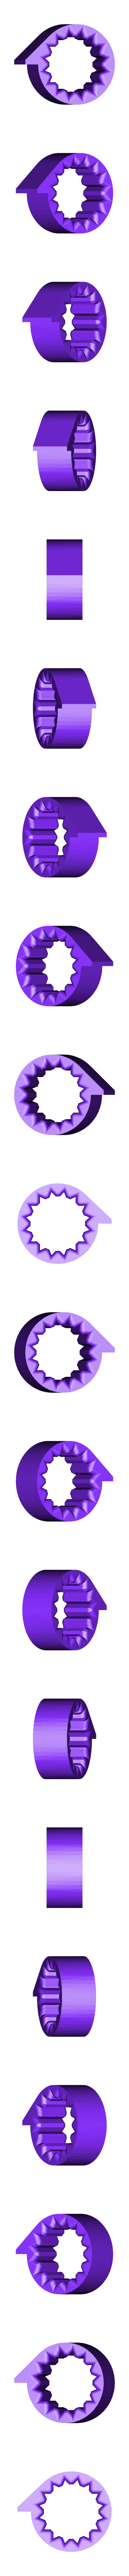 Cam_bolt_16b_1beat.STL Download free STL file My 3D (Dream Drum Design) • 3D print design, Tanleste46